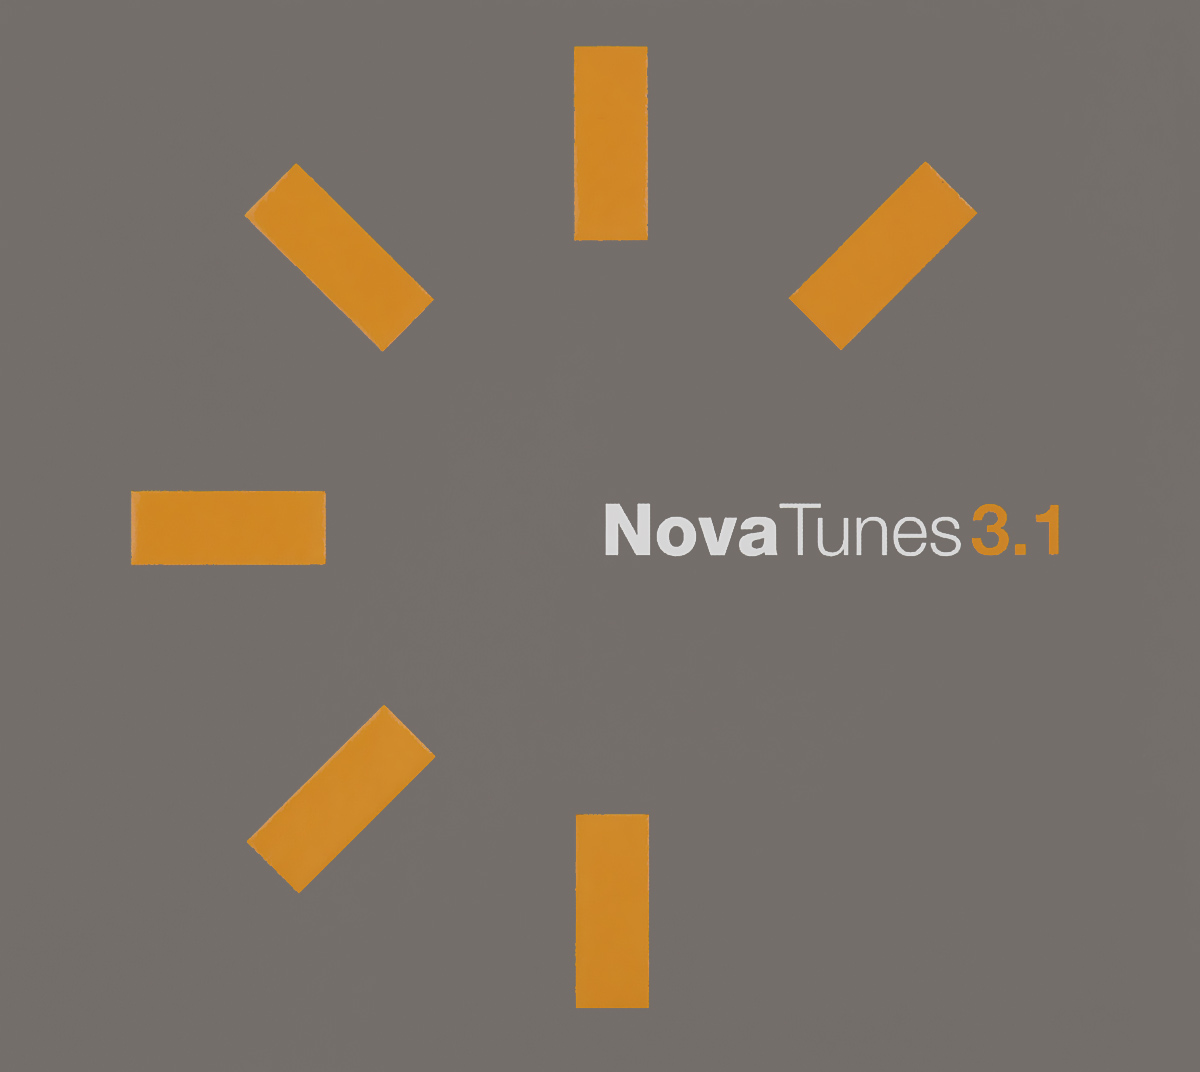 Nova Tunes 3.1